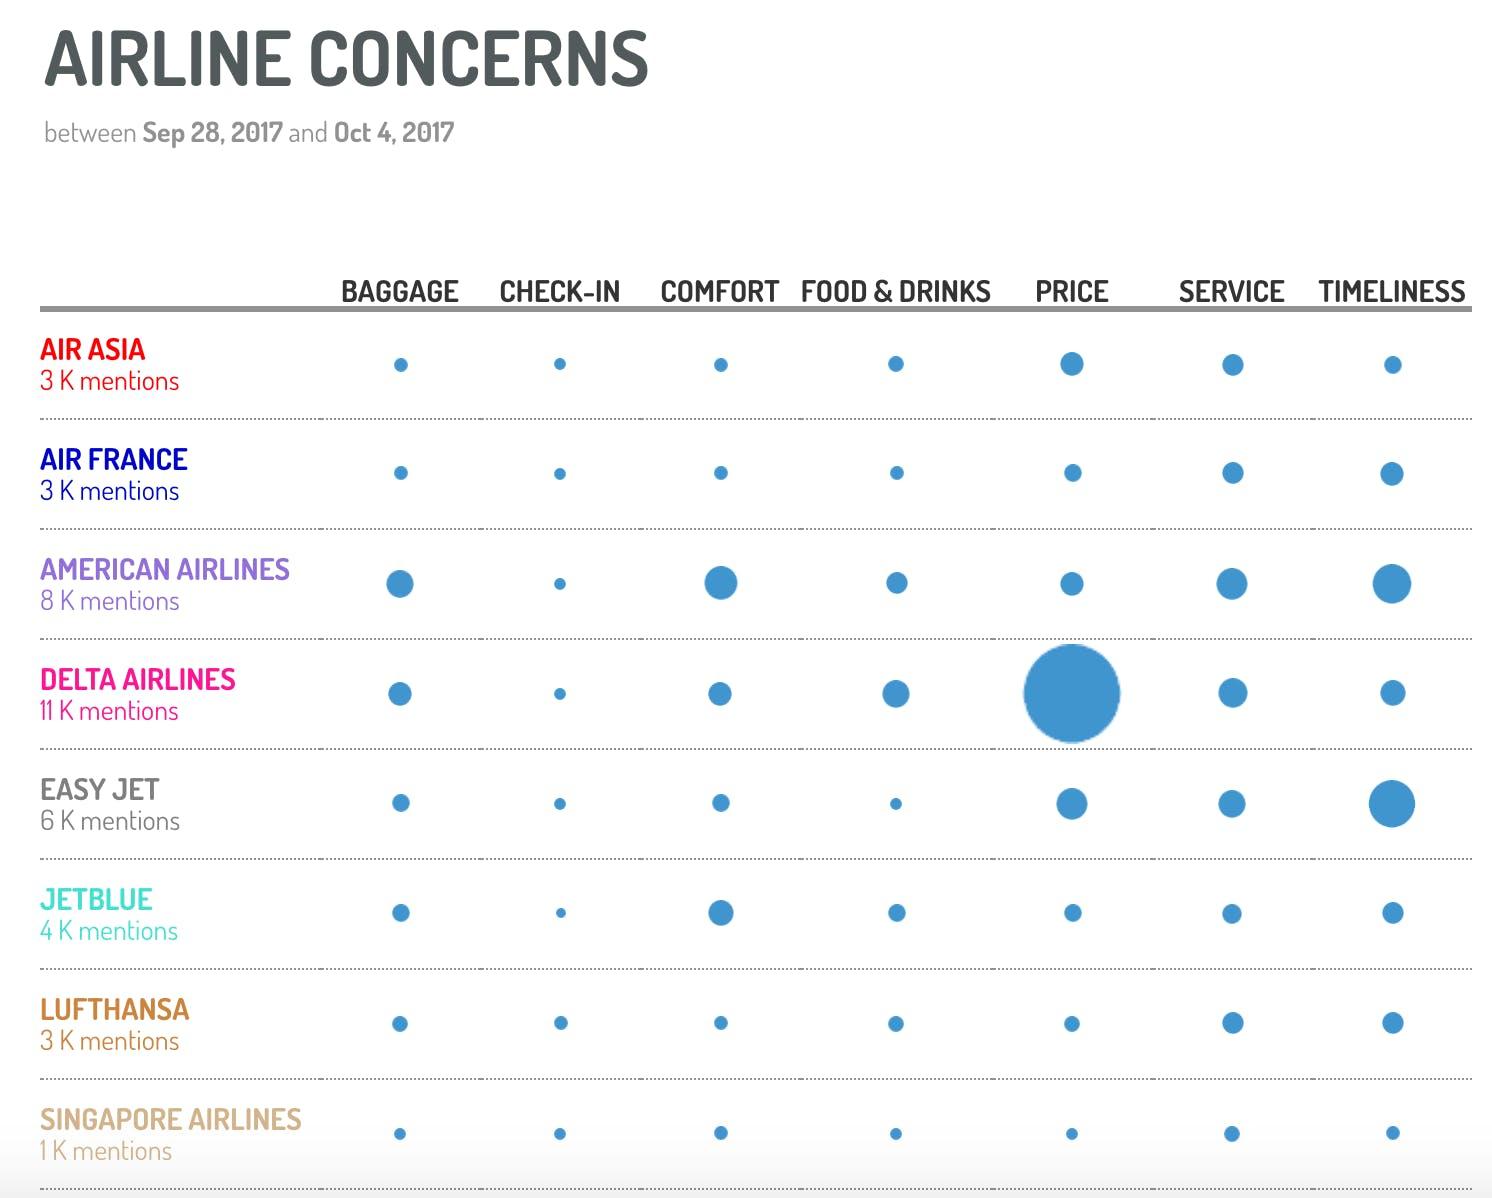 digimind social media sentiment analysis for social media monitoring tool